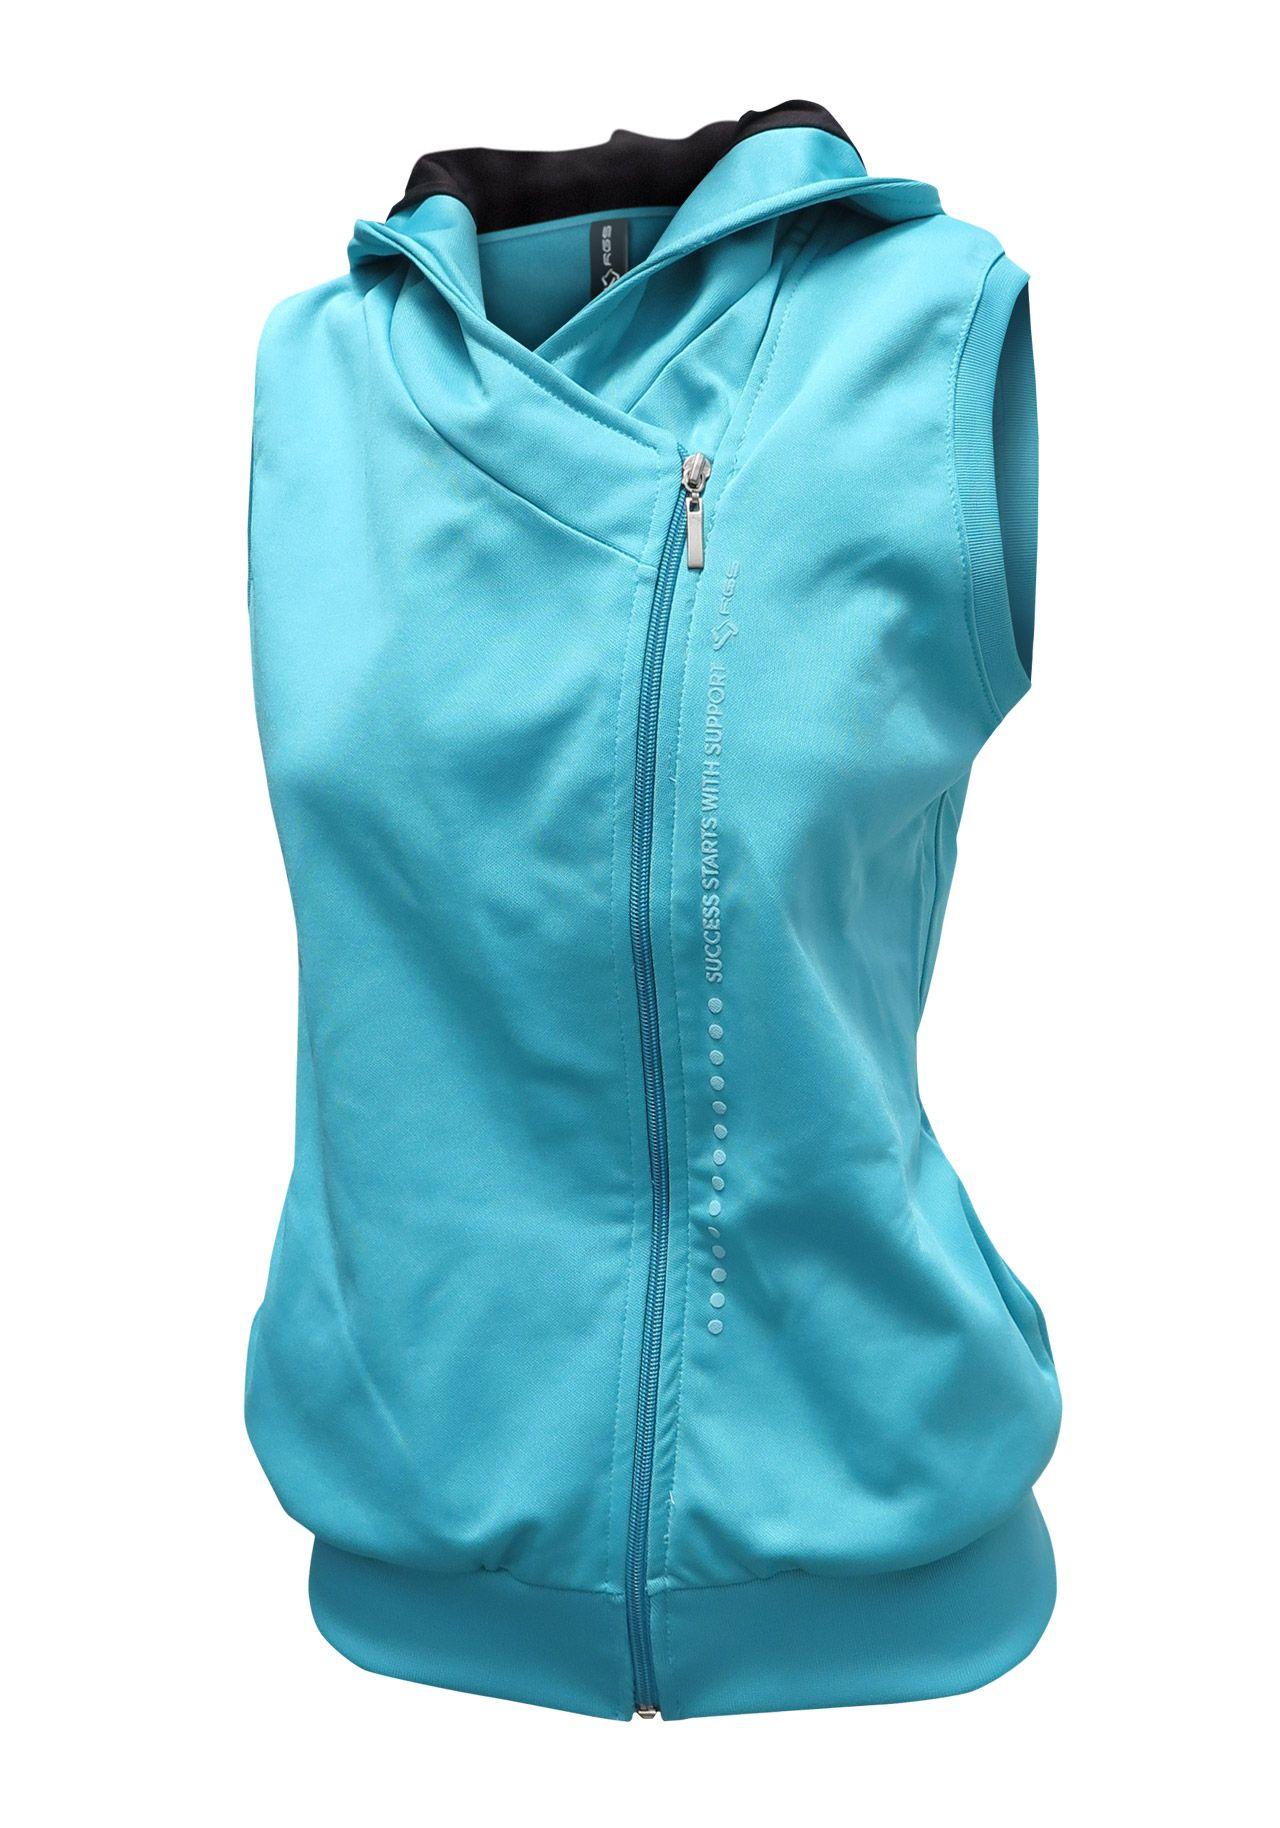 R16514 - Chaleco deportivo mujer cruzado -  sportwear Indumentaria Deportiva 29012b72e0578